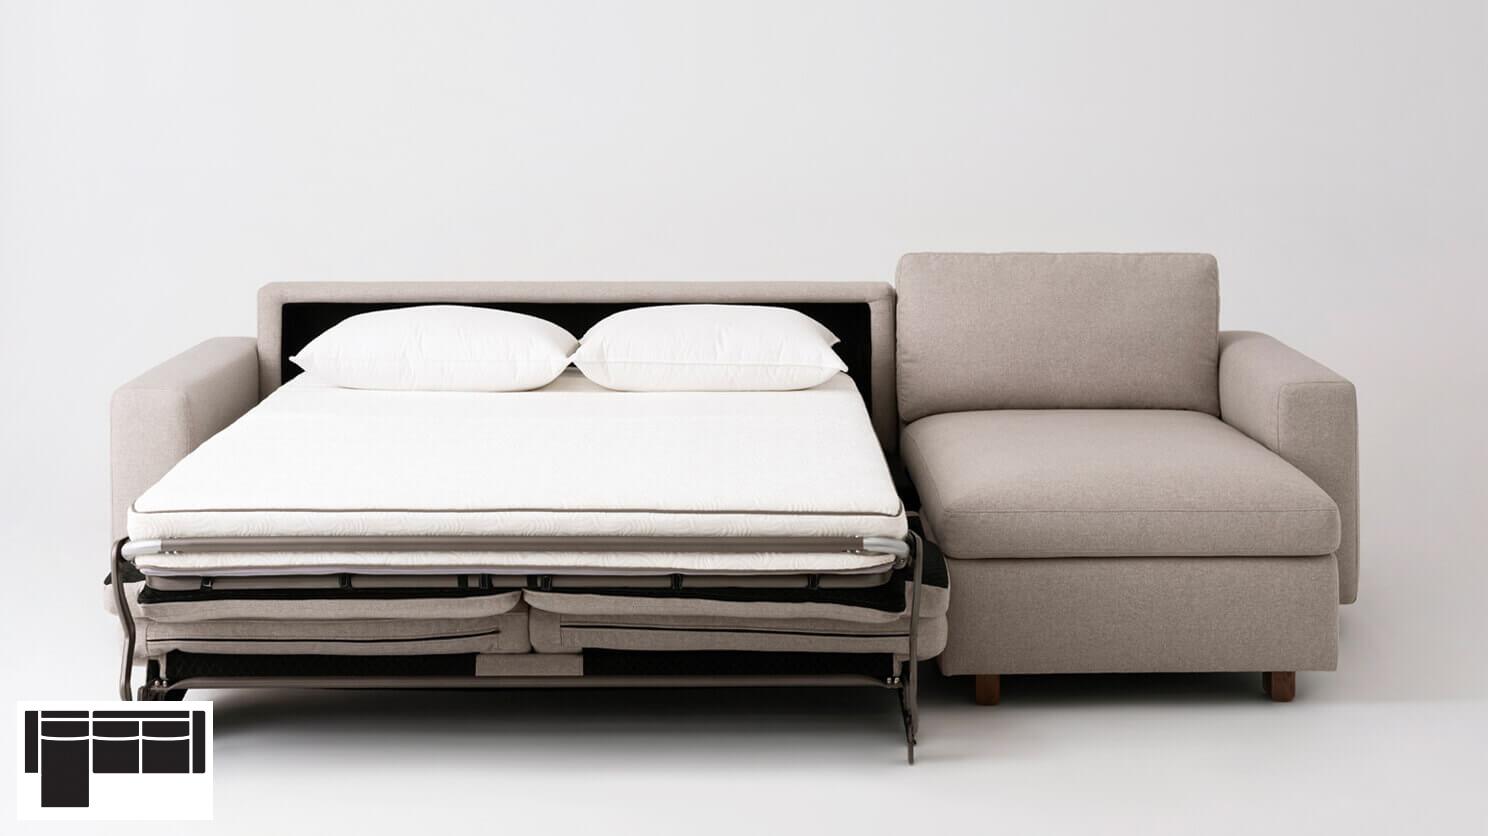 Reva Sectional Storage Sofa Bed Laf